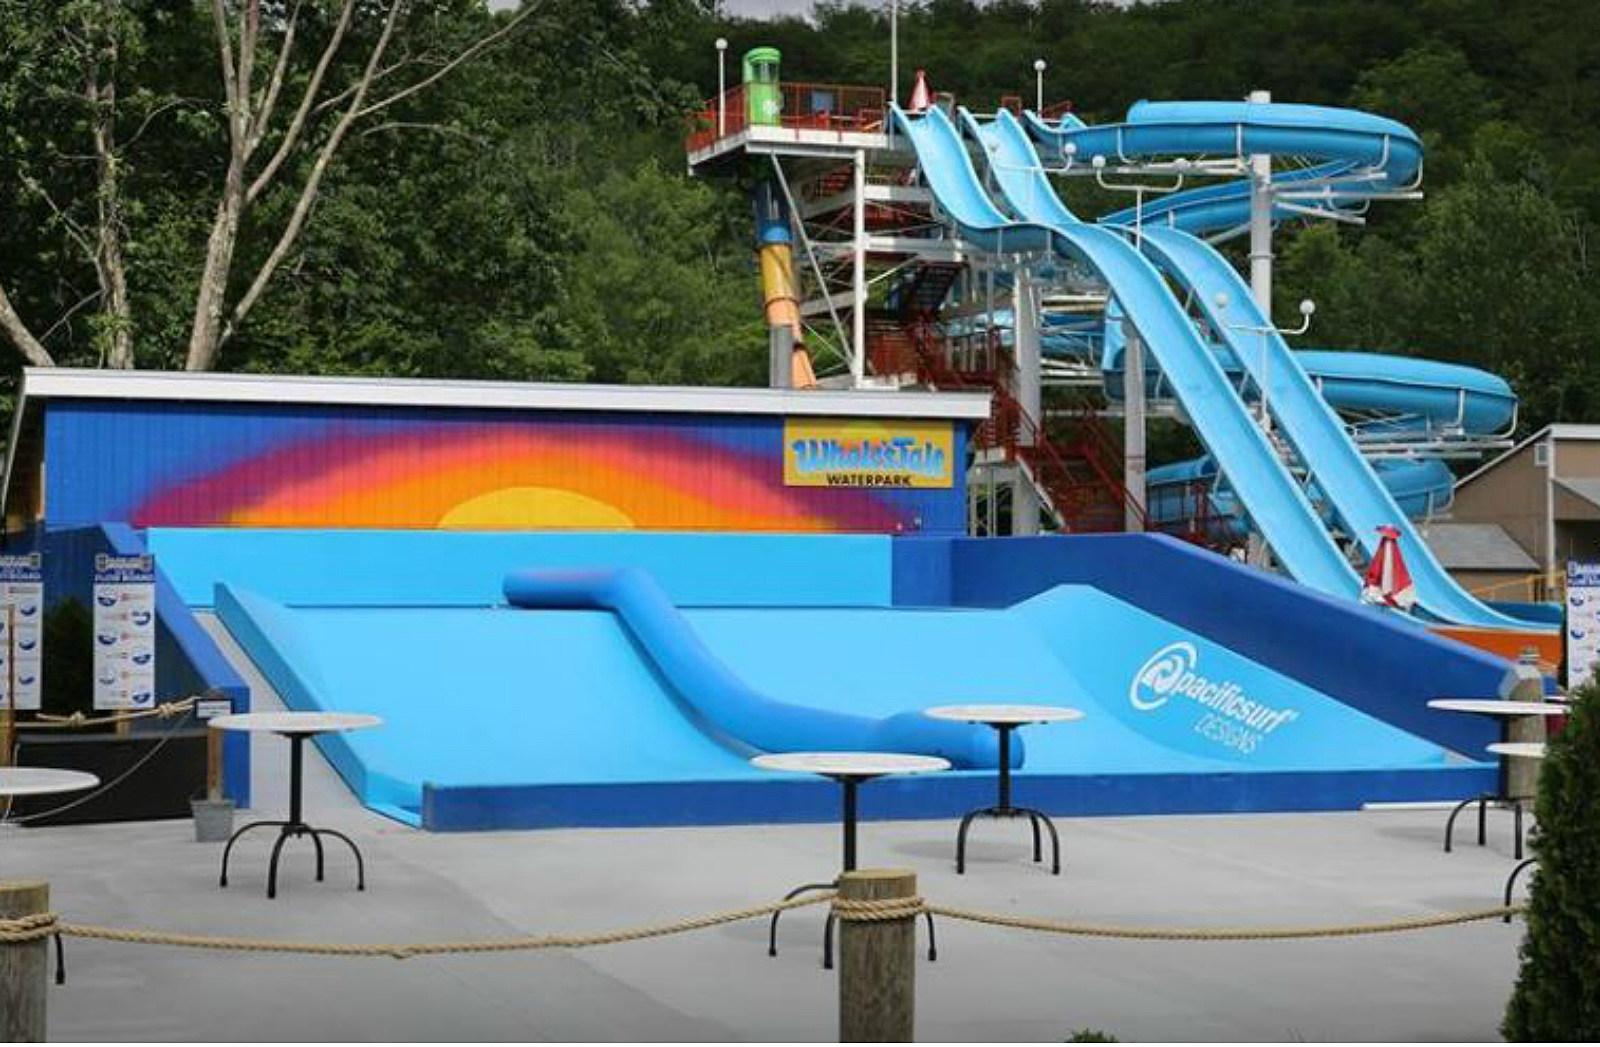 Whale's Tale Water Park via Facebook